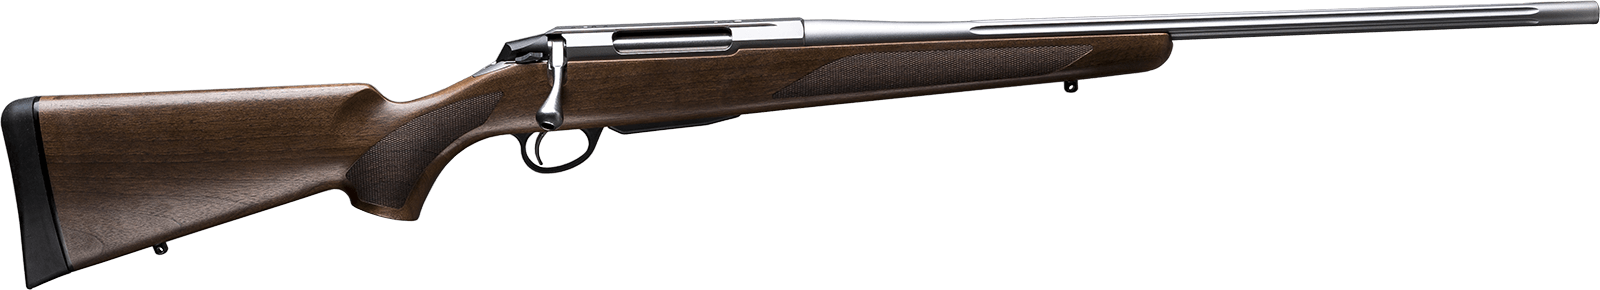 Best Deer Rifles Of 2017   Grand View Outdoors